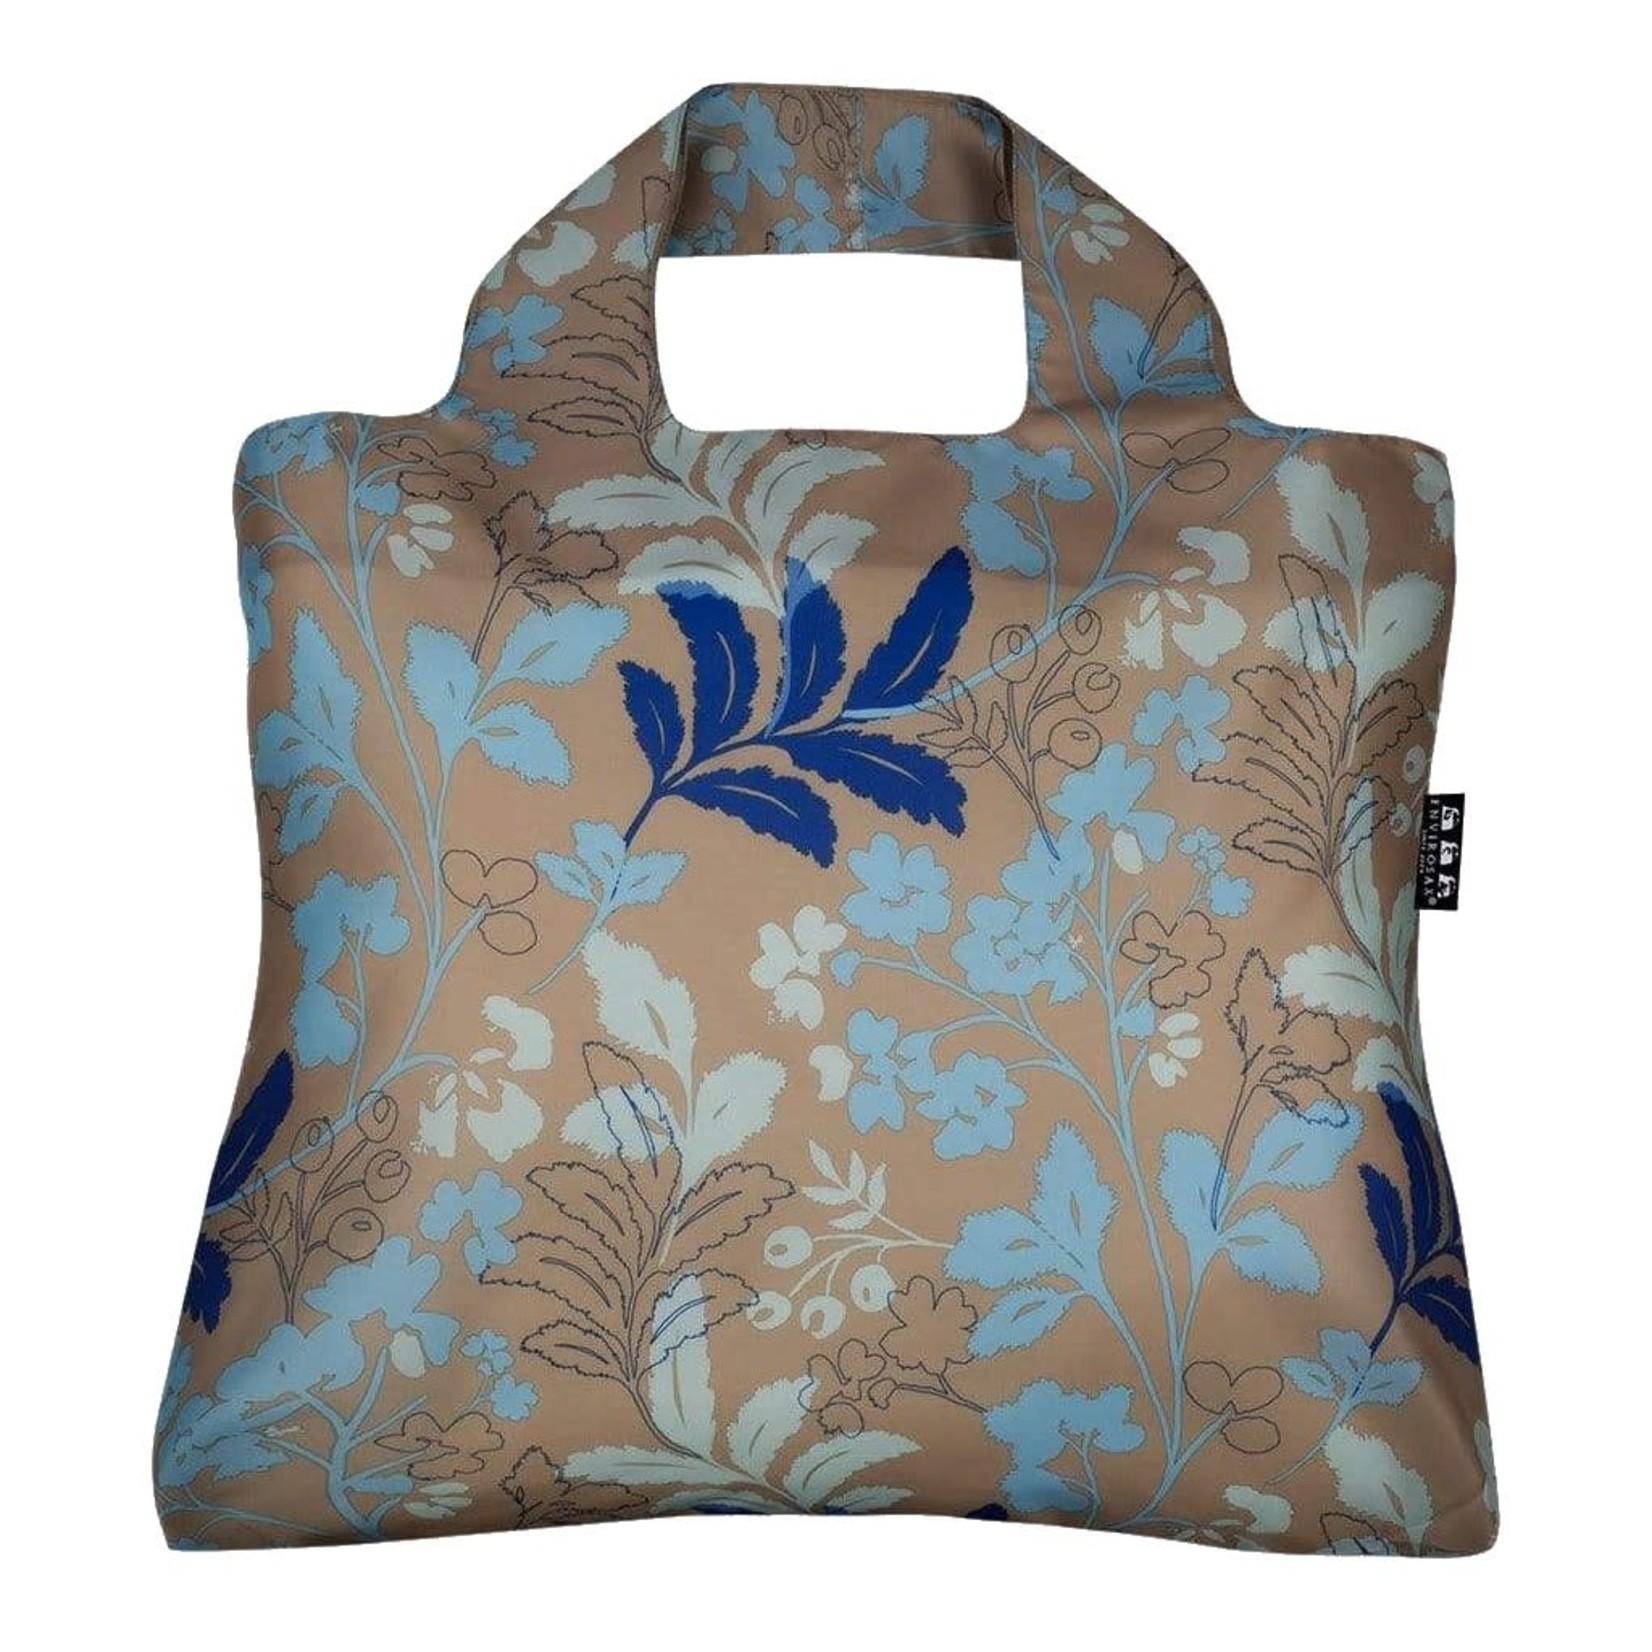 Envirosax Envirosax Mallorca Bag: